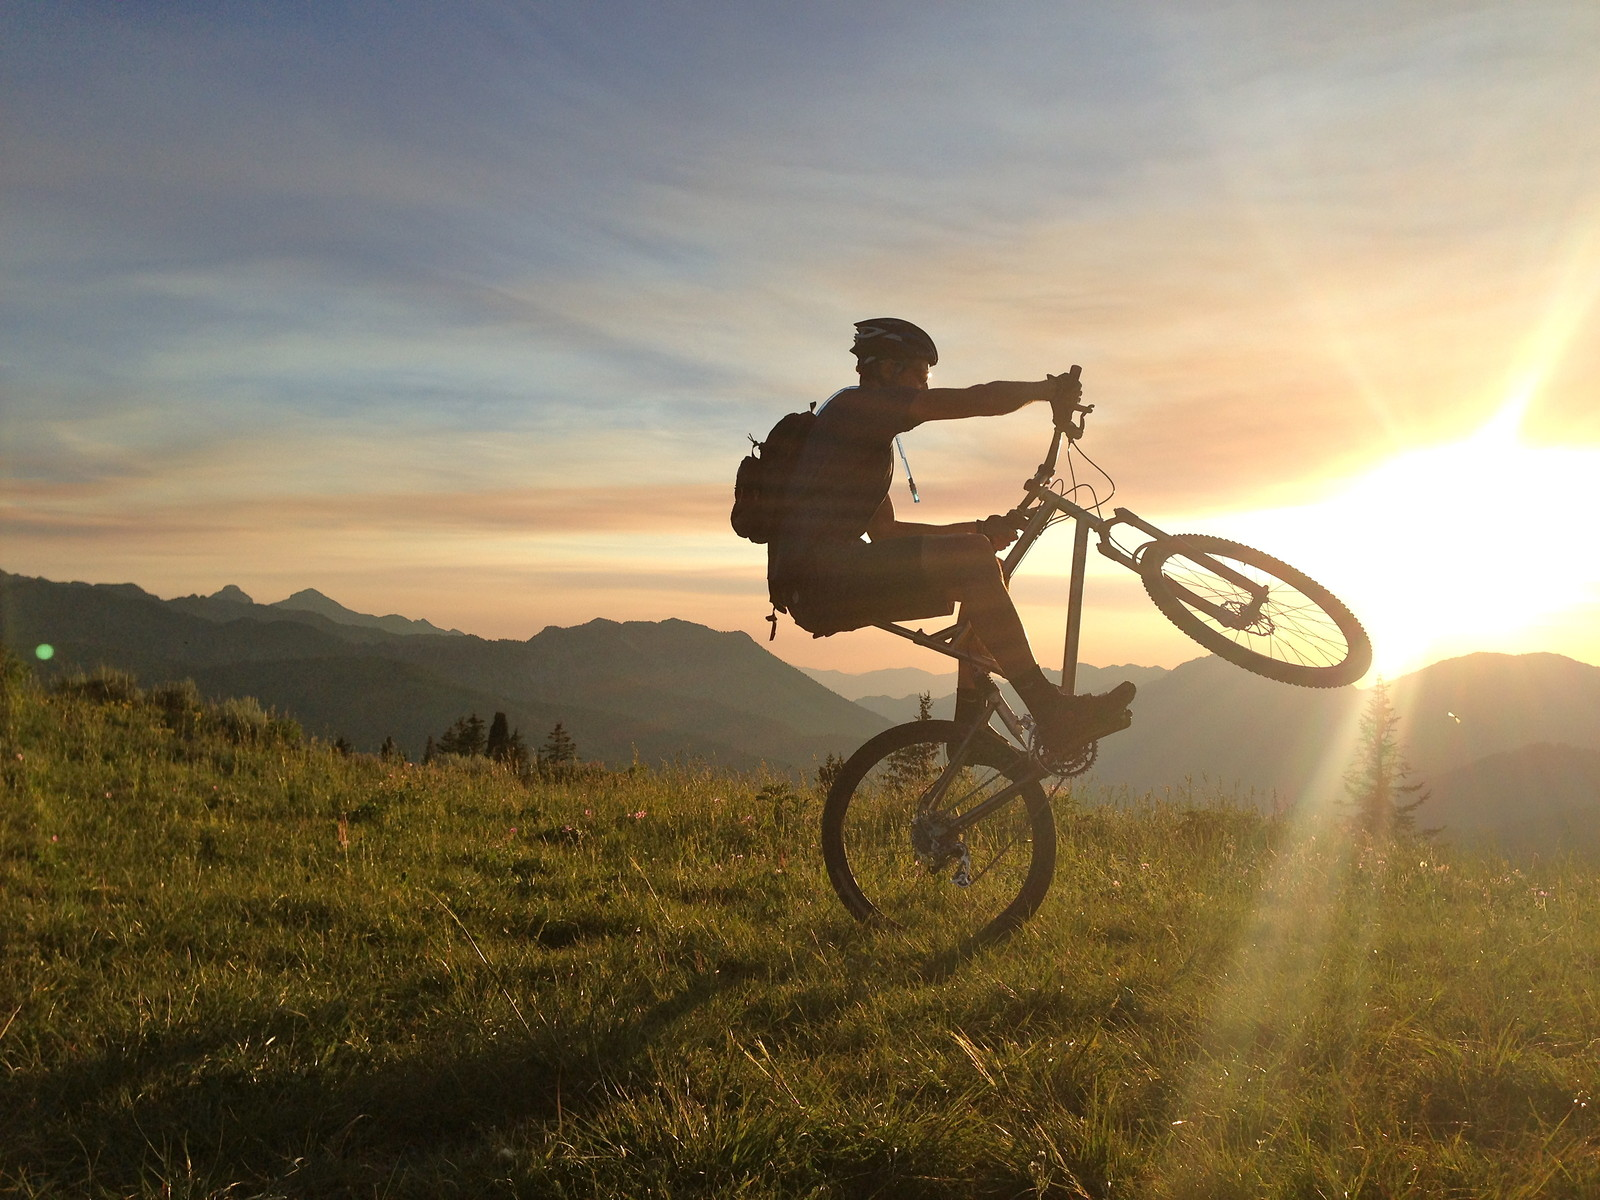 Rocky Mountain Wheelie - hamstring - Mountain Biking Pictures - Vital MTB